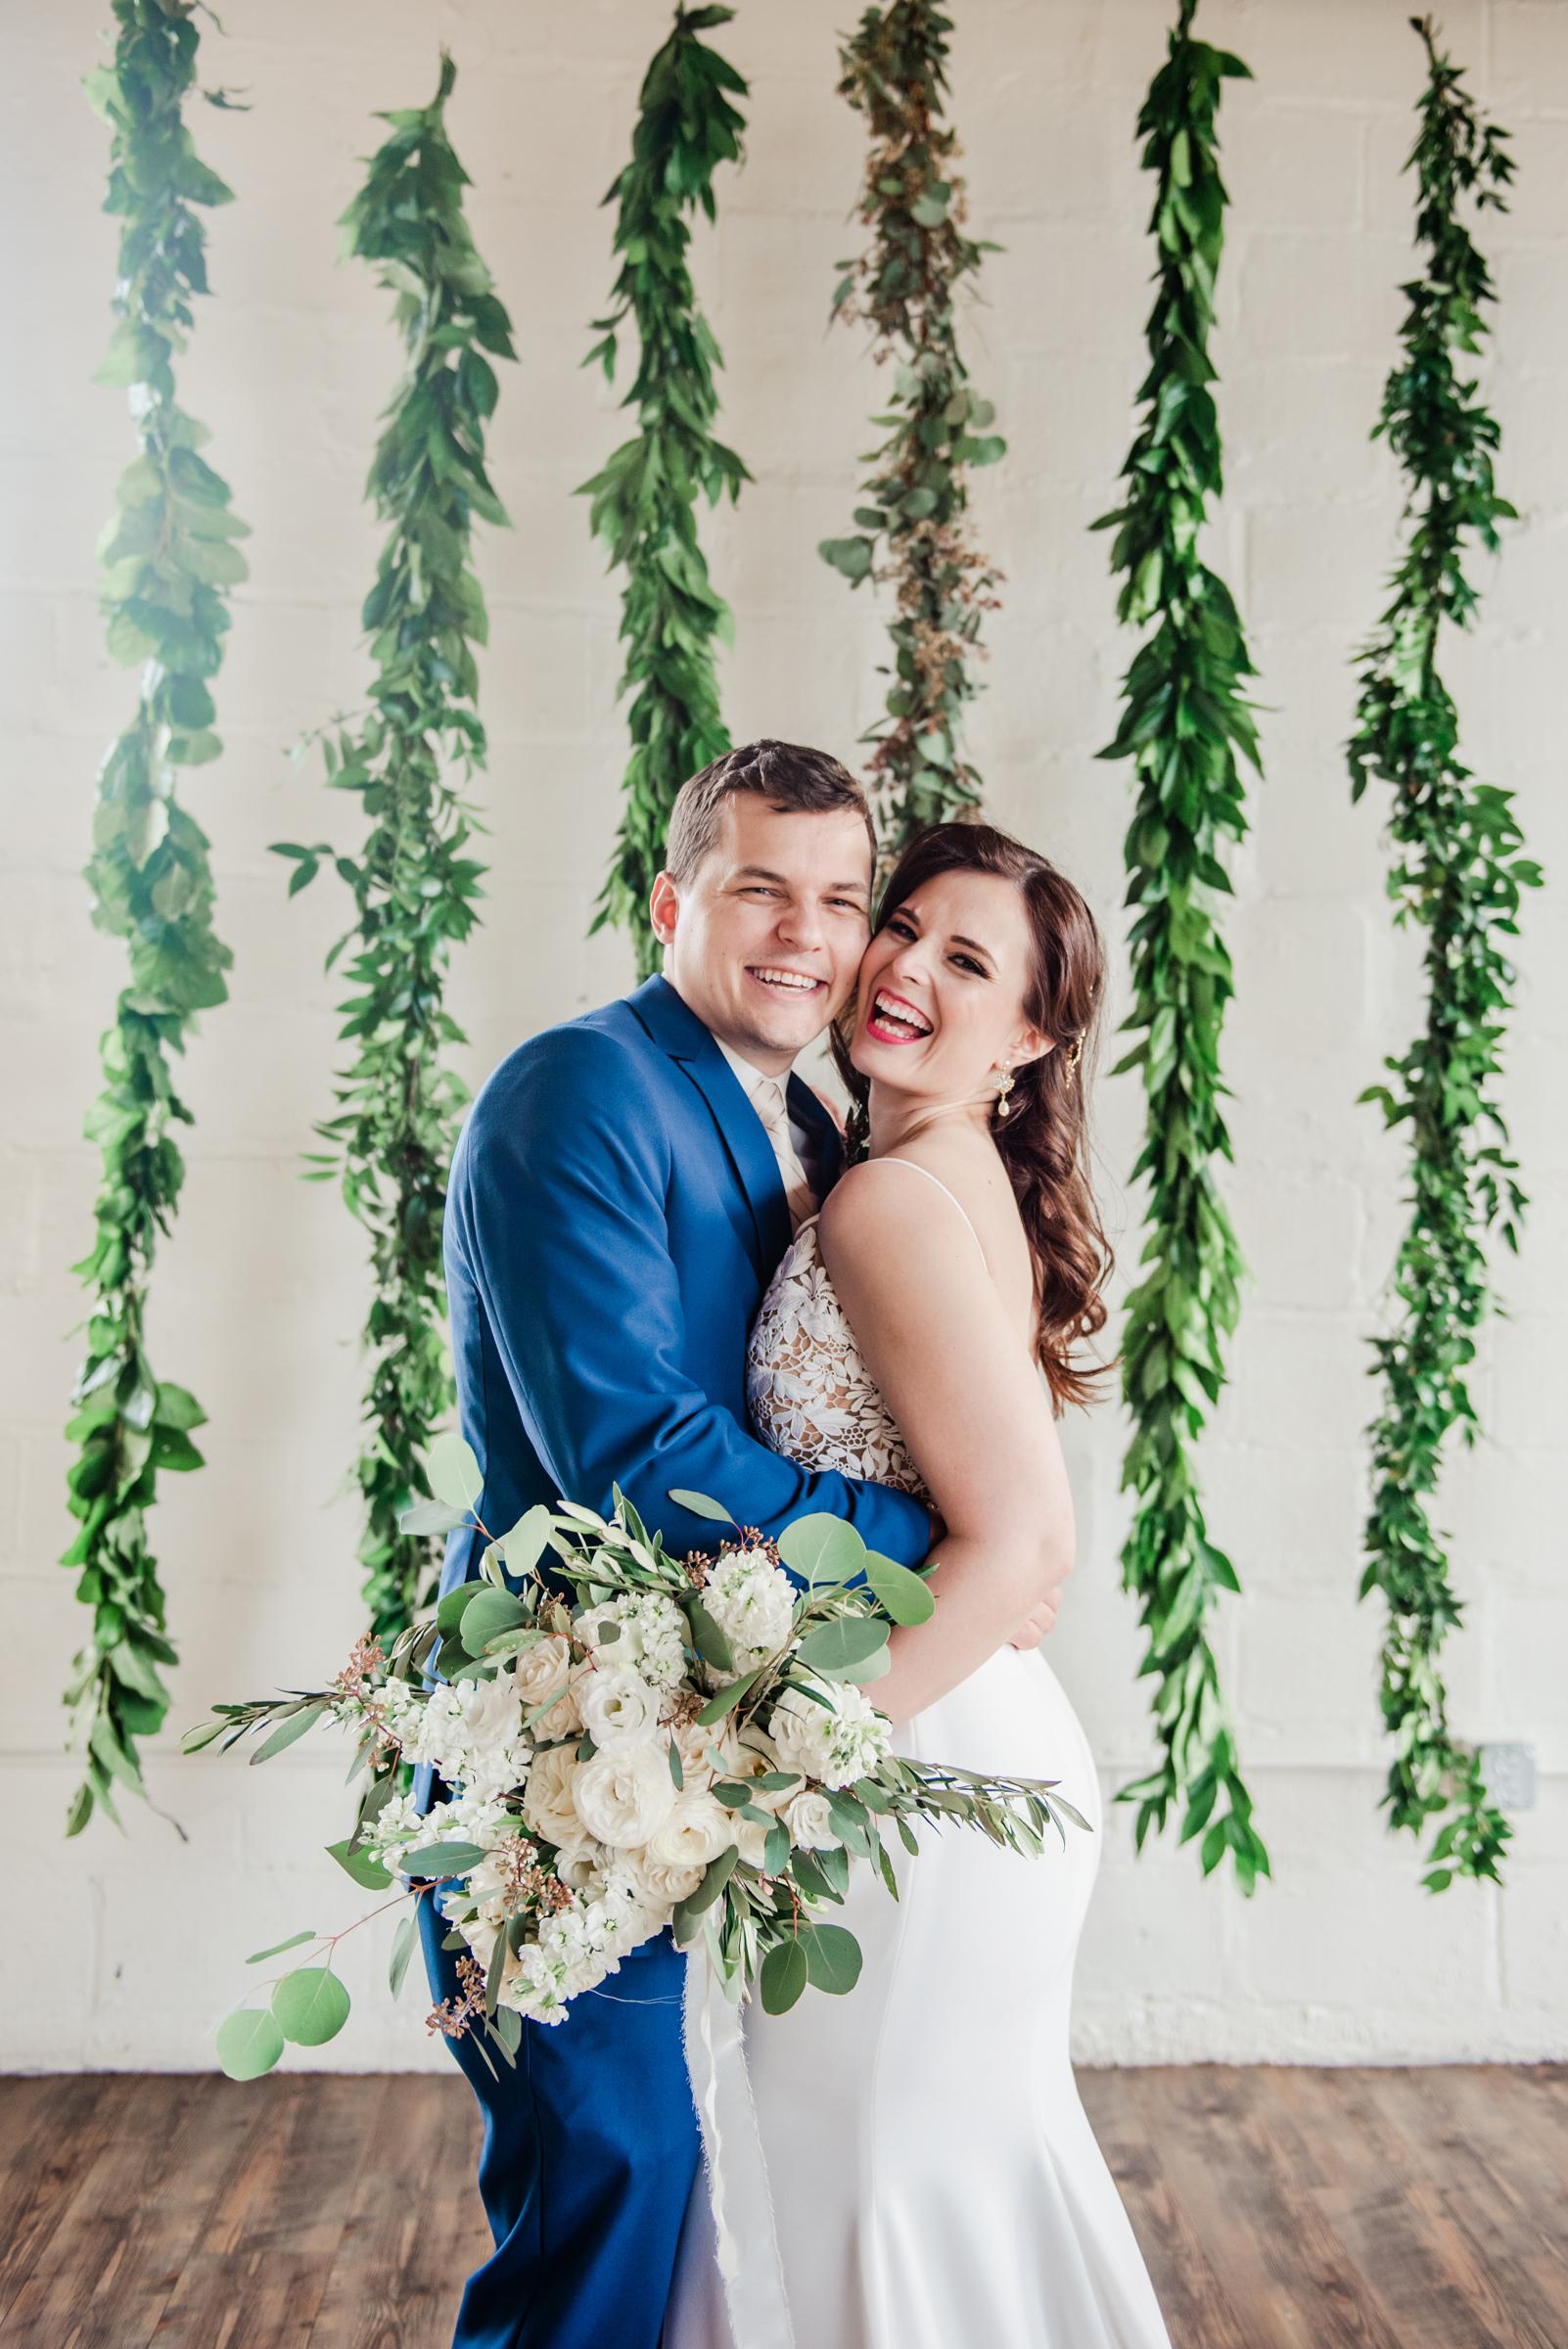 The_Arbor_LoftRochester_Wedding_JILL_STUDIO_Rochester_NY_Photographer_161312.jpg